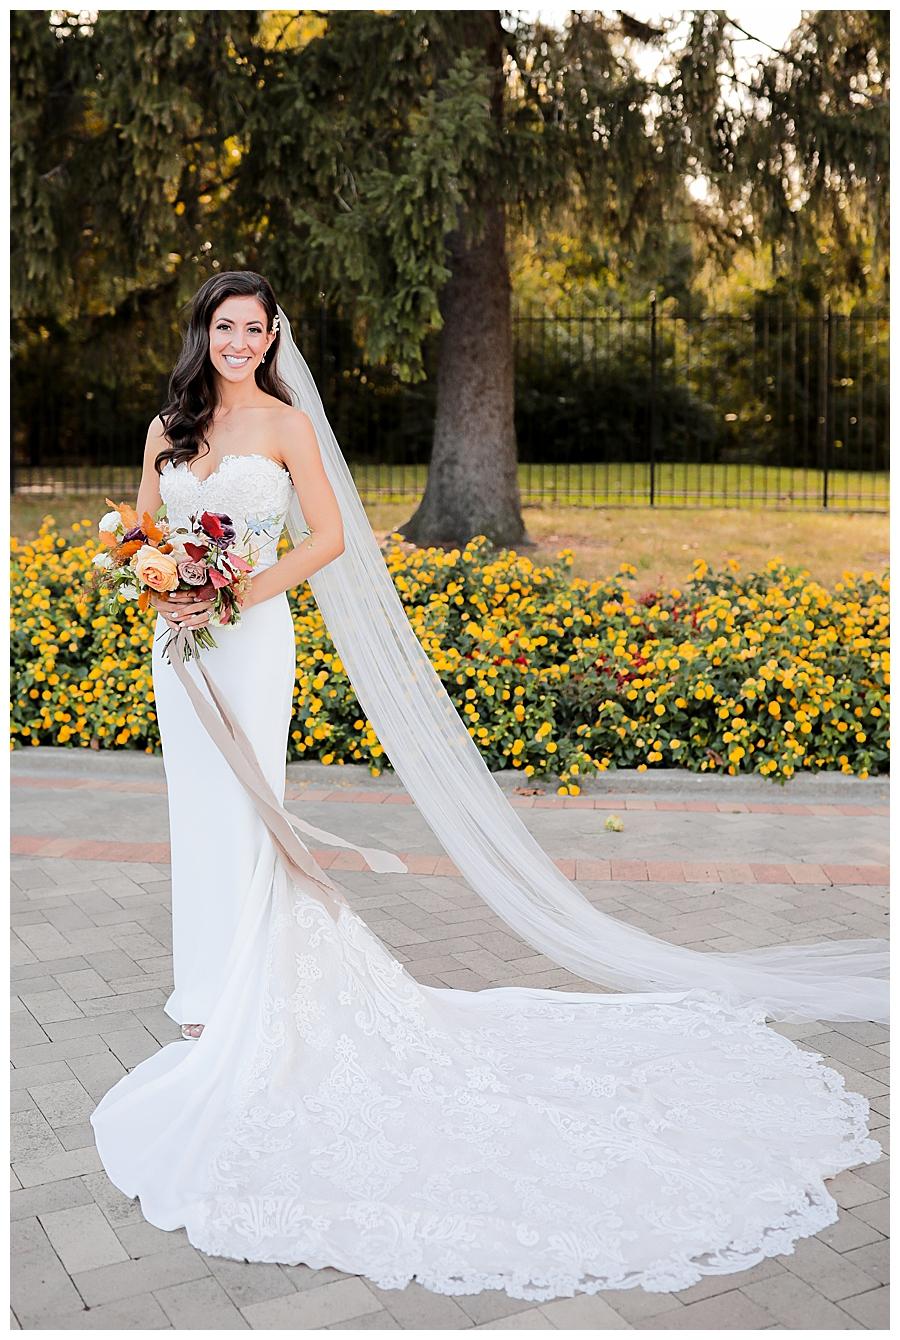 Indianapolis-Indiana-Wedding-Photography-Meghan-Harrison_0303.jpg